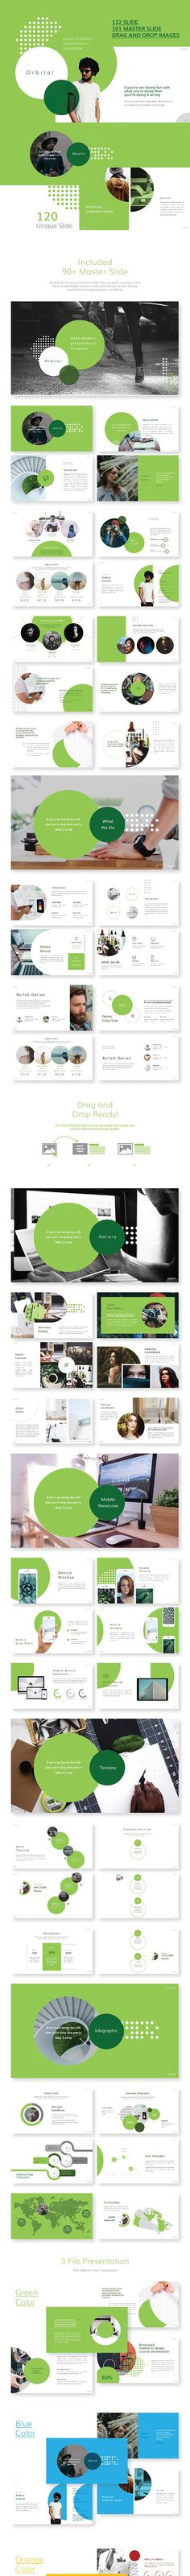 Orbital - Neue Minimalist Powerpoint Presentation by Benstudio73 | GraphicRiver Business Presentation, Presentation Design, Presentation Templates, Powerpoint Charts, Slide Design, Line Icon, Vector Icons, Make It Simple, Minimalist